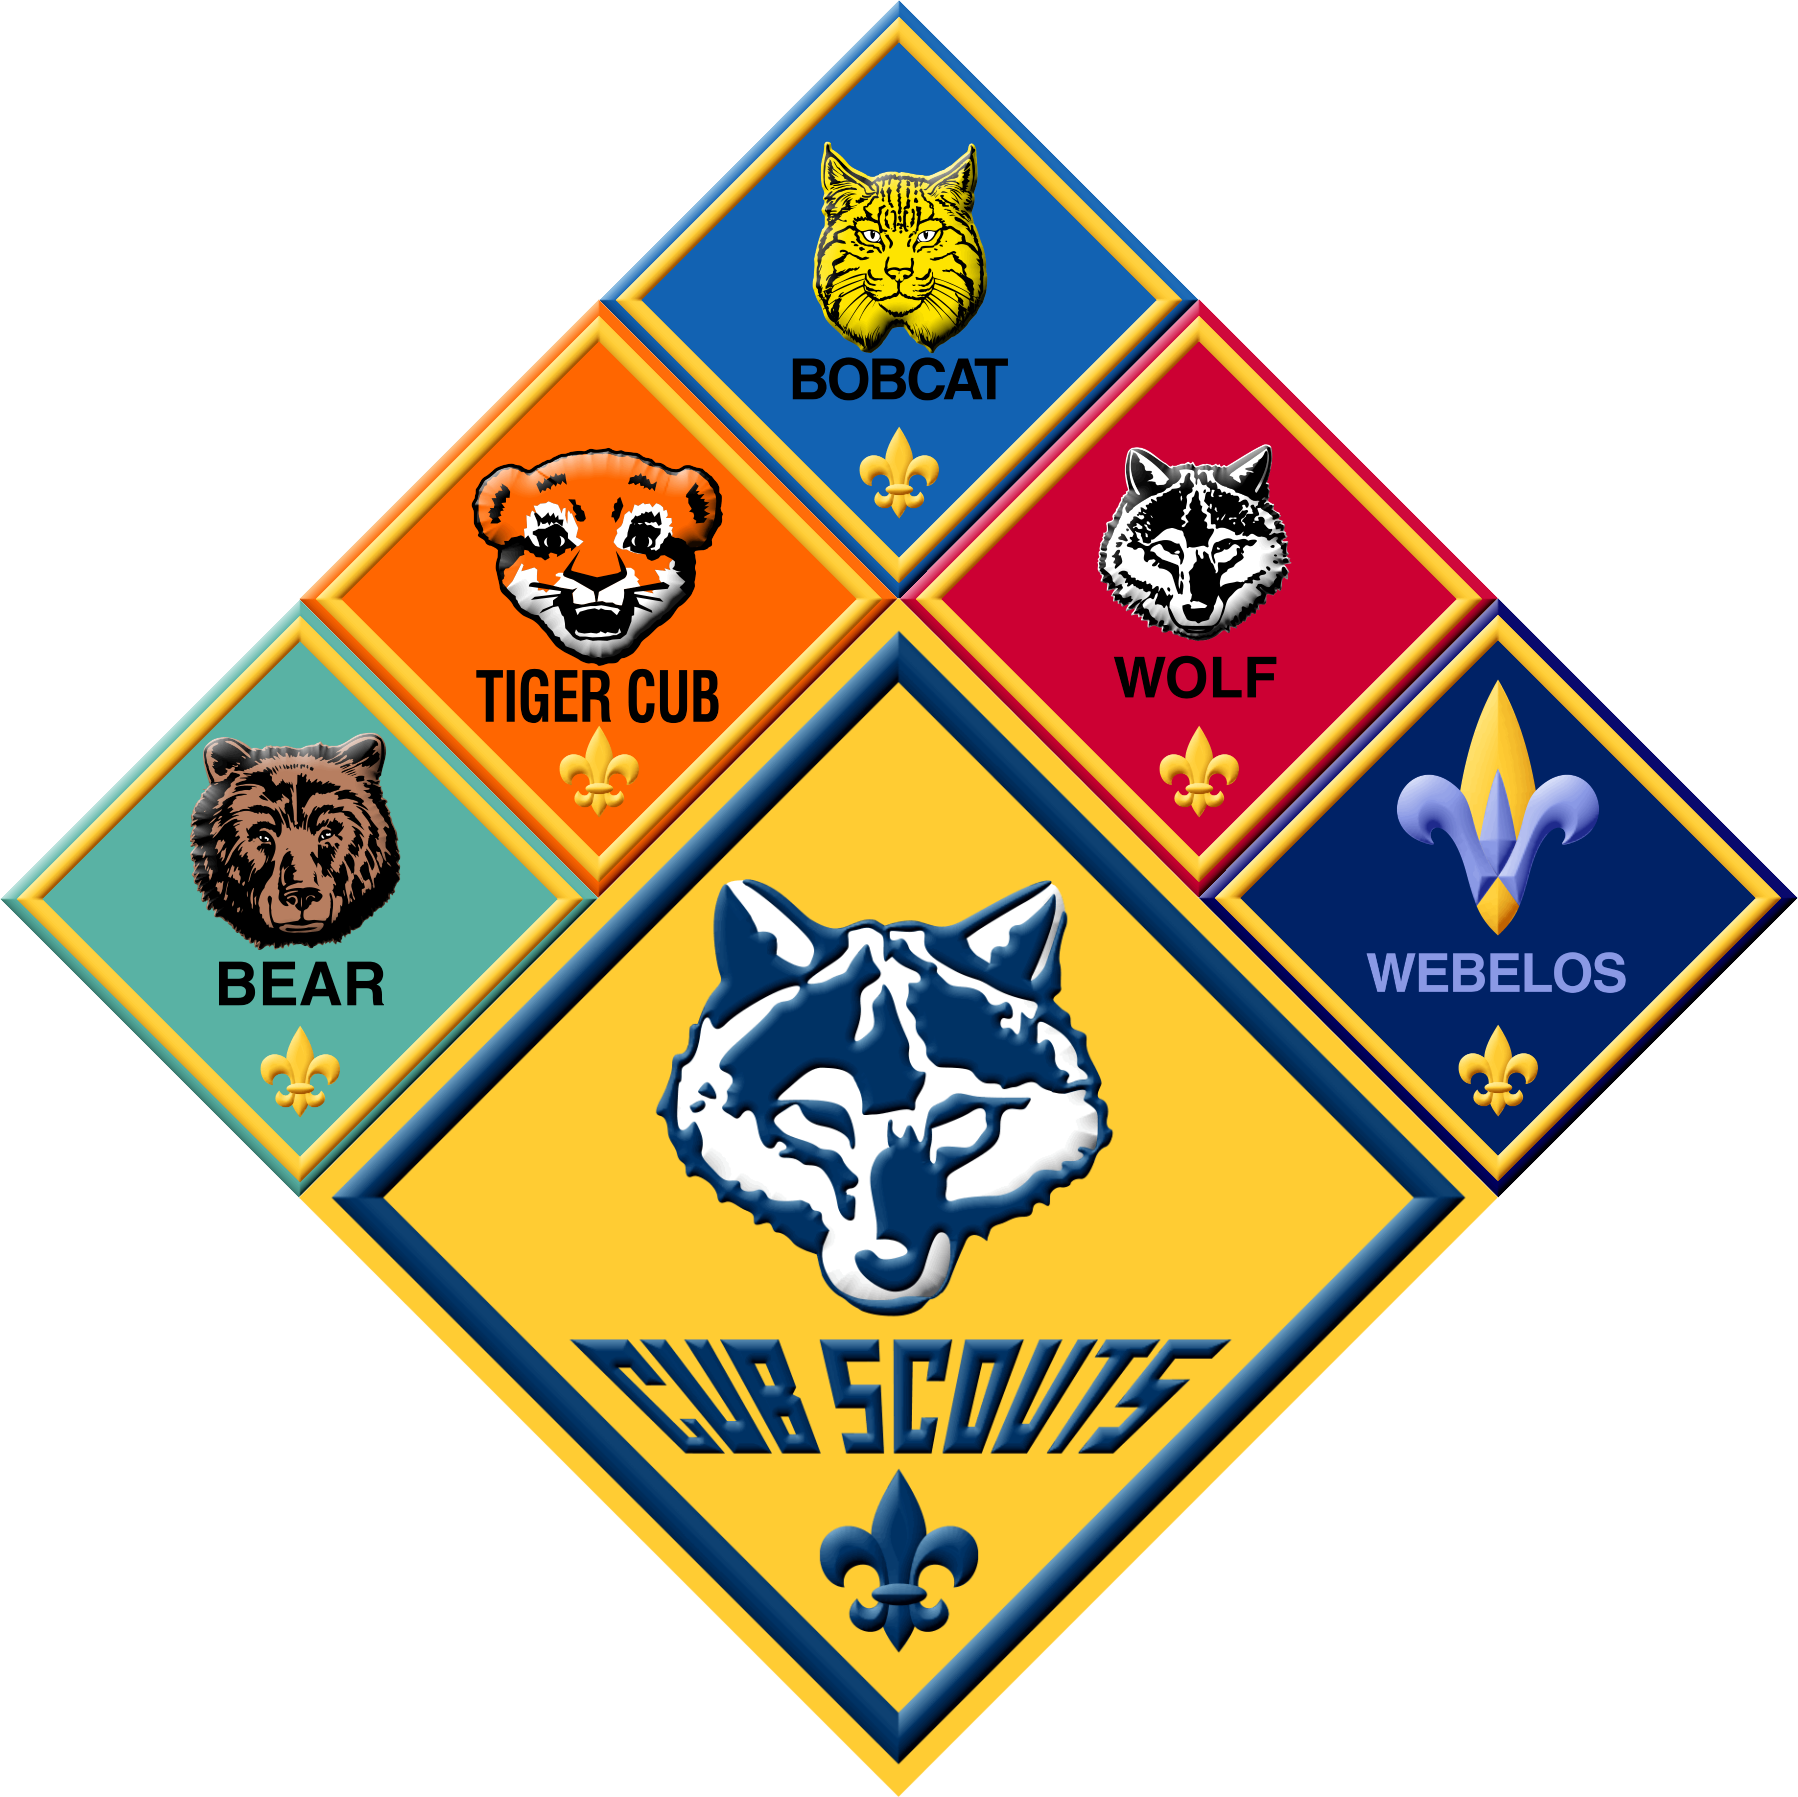 Bobcat clipart cub scout. Clovis pack scouts corner